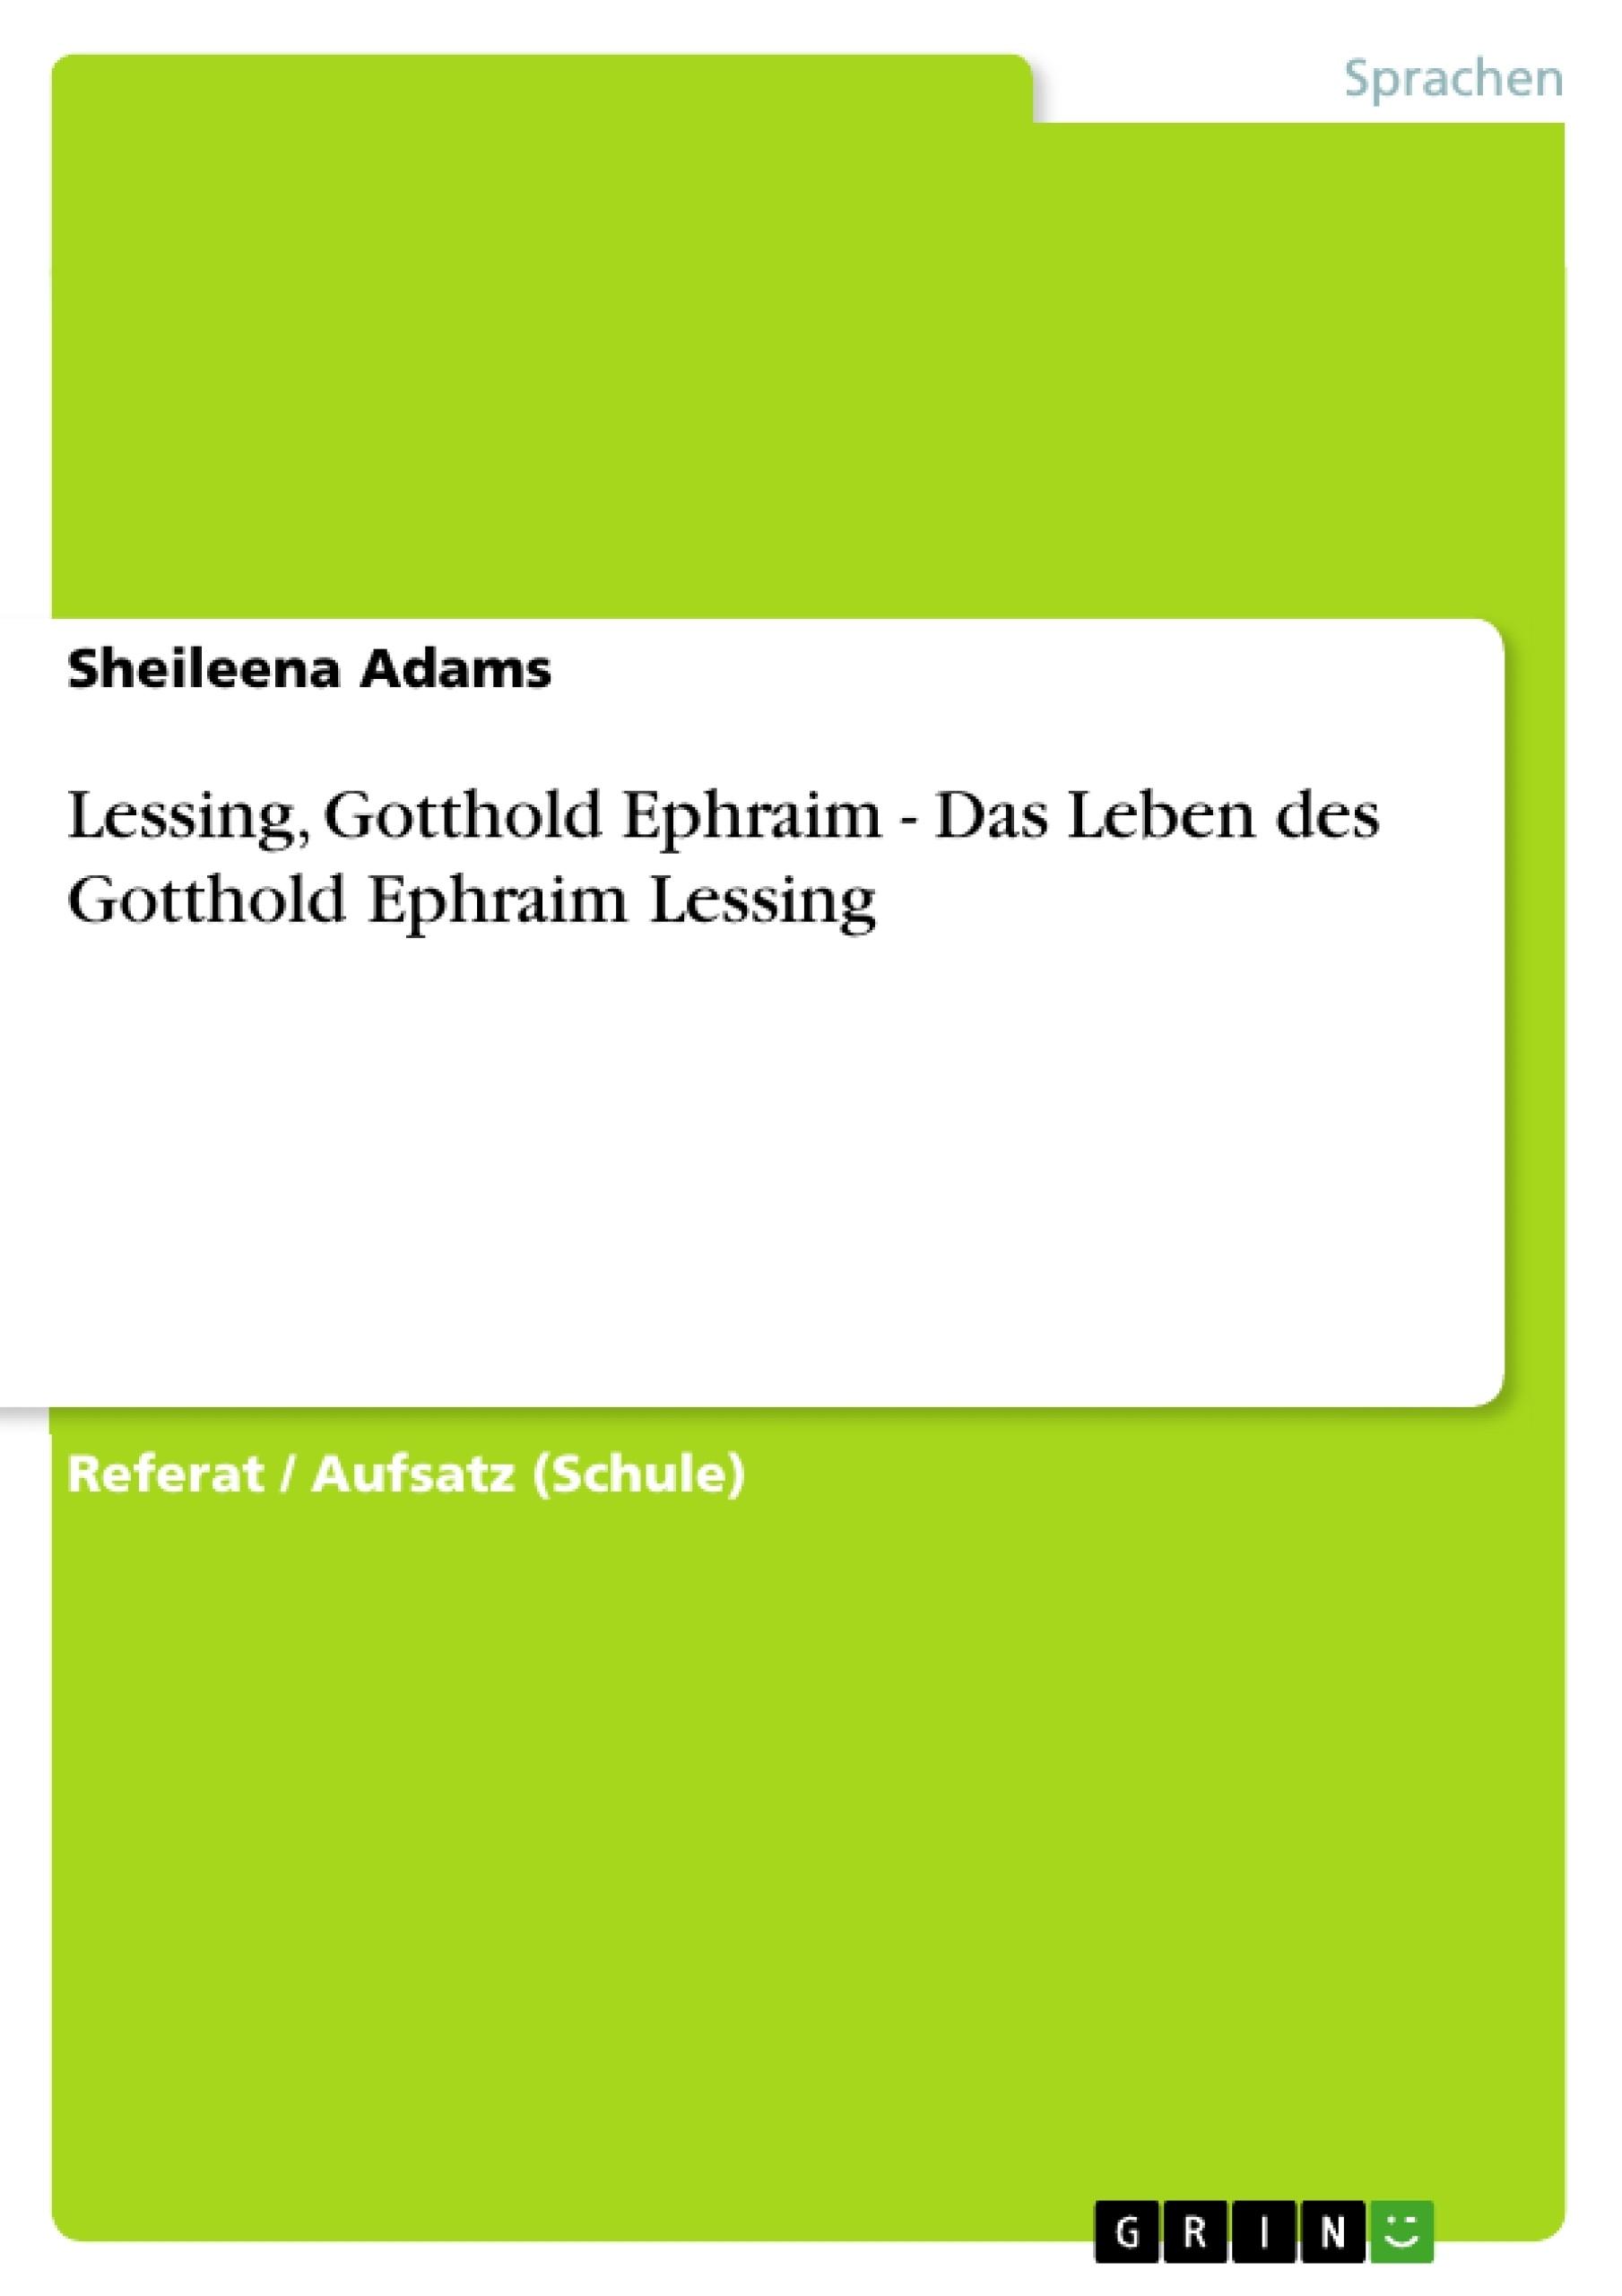 Titel: Lessing, Gotthold Ephraim - Das Leben des Gotthold Ephraim Lessing